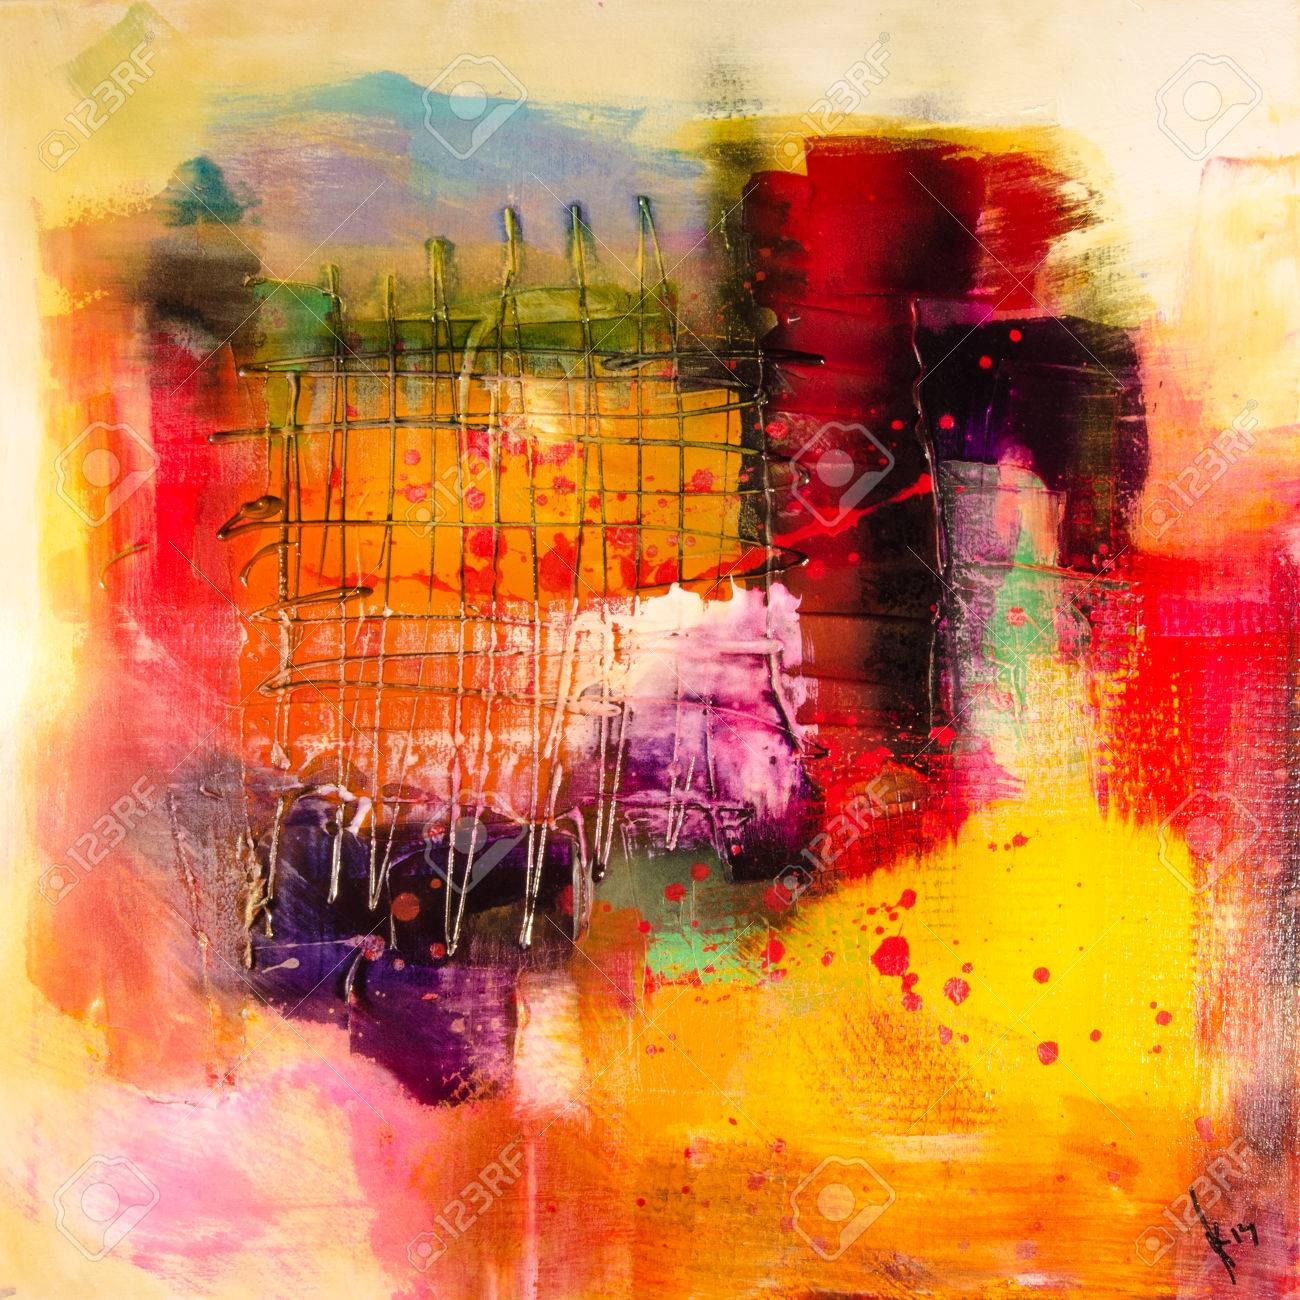 Modern Abstrakt Painting Fine Art Artprint Stock Photo, Picture And ...